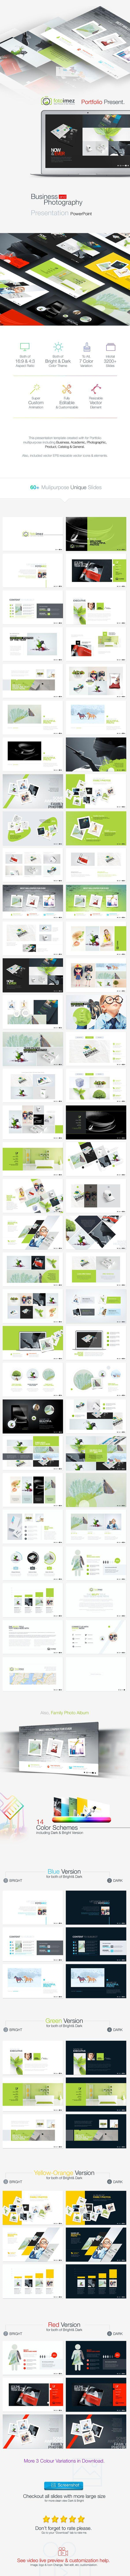 FotoImez | Portfolio Multipurpose Powerpoint Presentation Template • Only available here ➝ http://graphicriver.net/item/fotoimez-portfolio-multipurpose-presentation/10310382?ref=pxcr